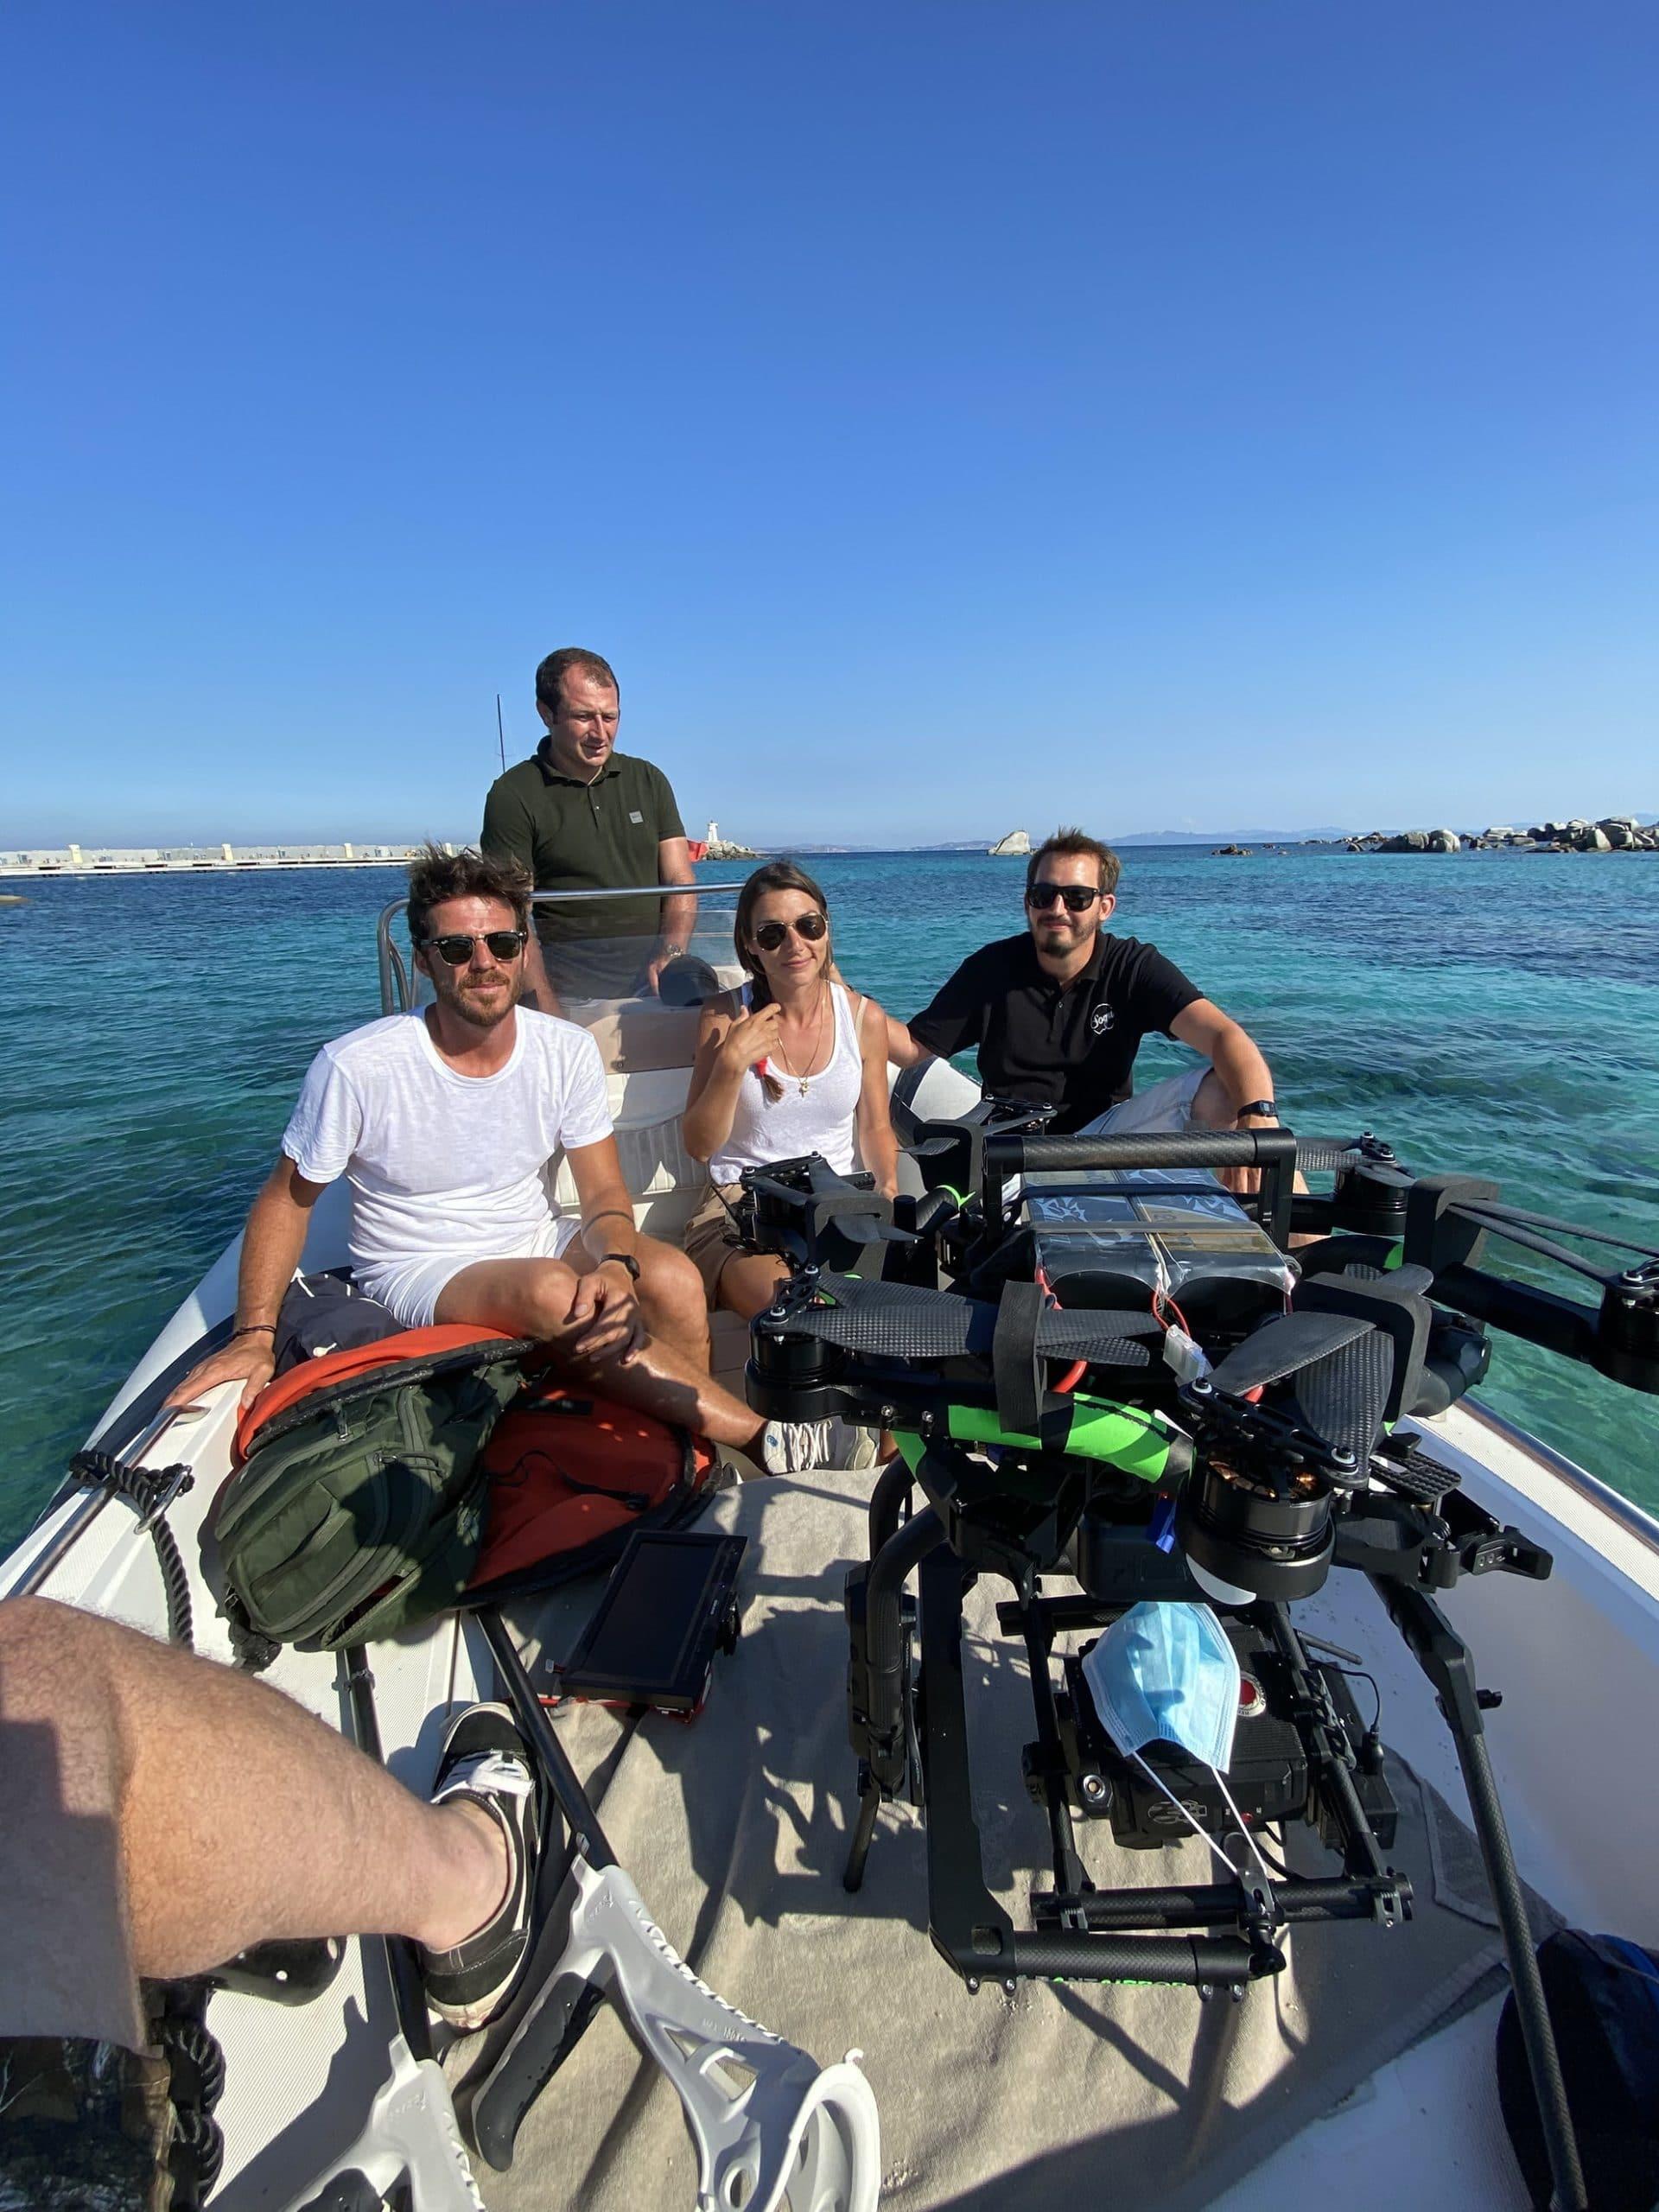 tournage-drone-cinema-corse-min-scaled